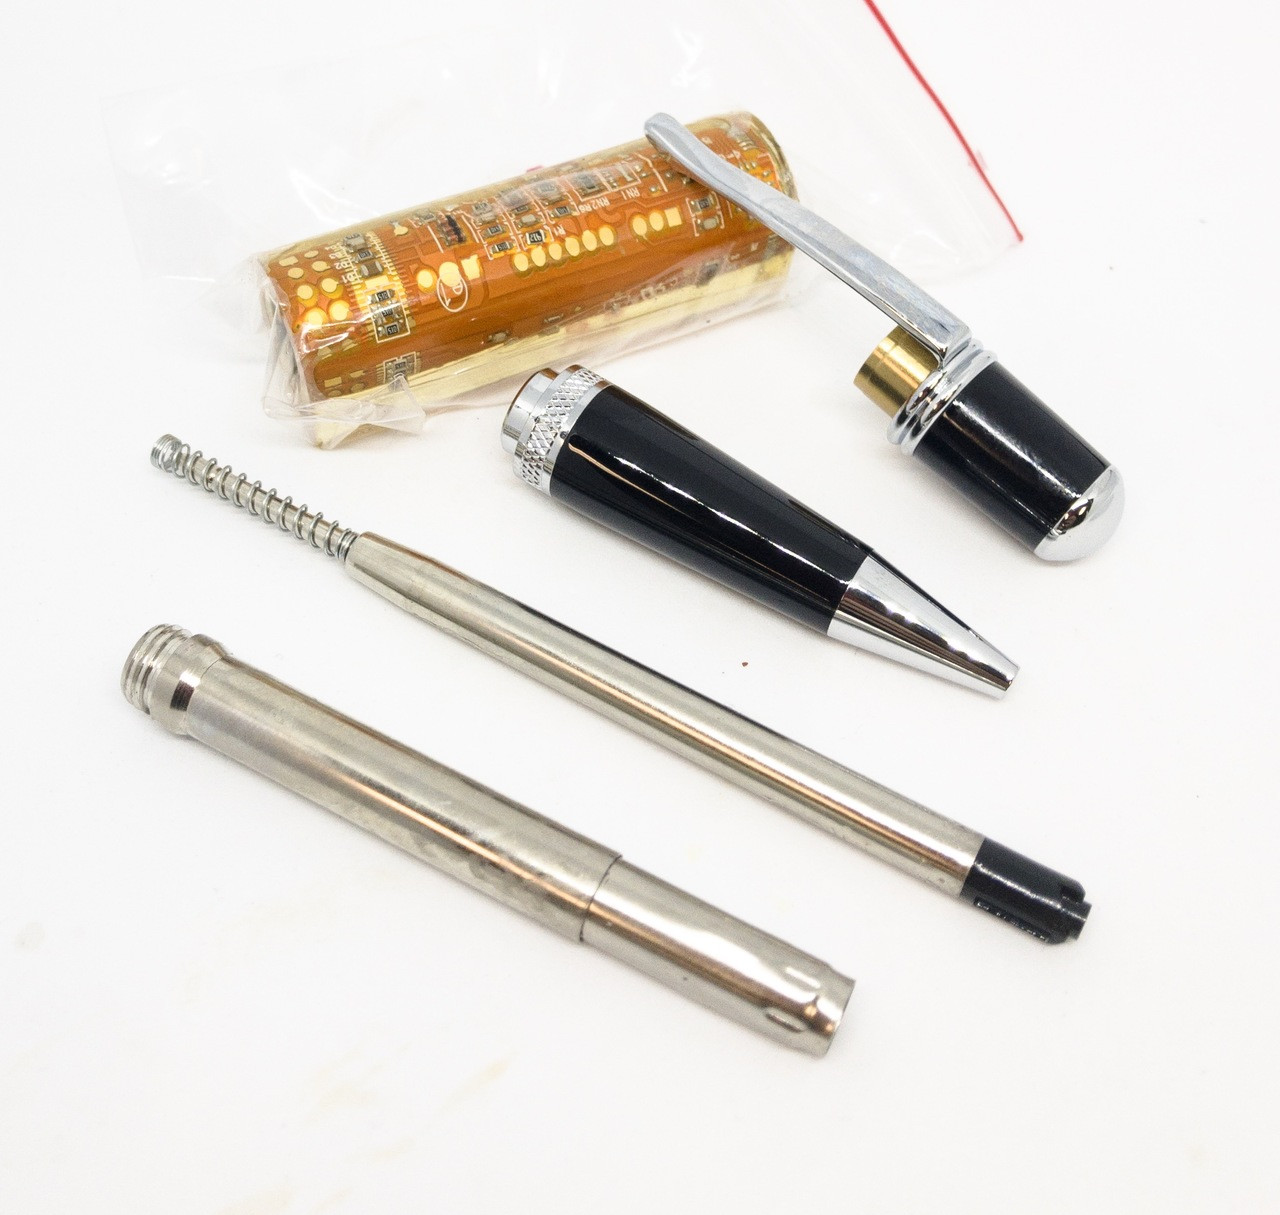 circuit board pen kit new model wiring diagramwall street iii orange circuit board ballpoint pen kit chromewall street iii orange circuit board ballpoint